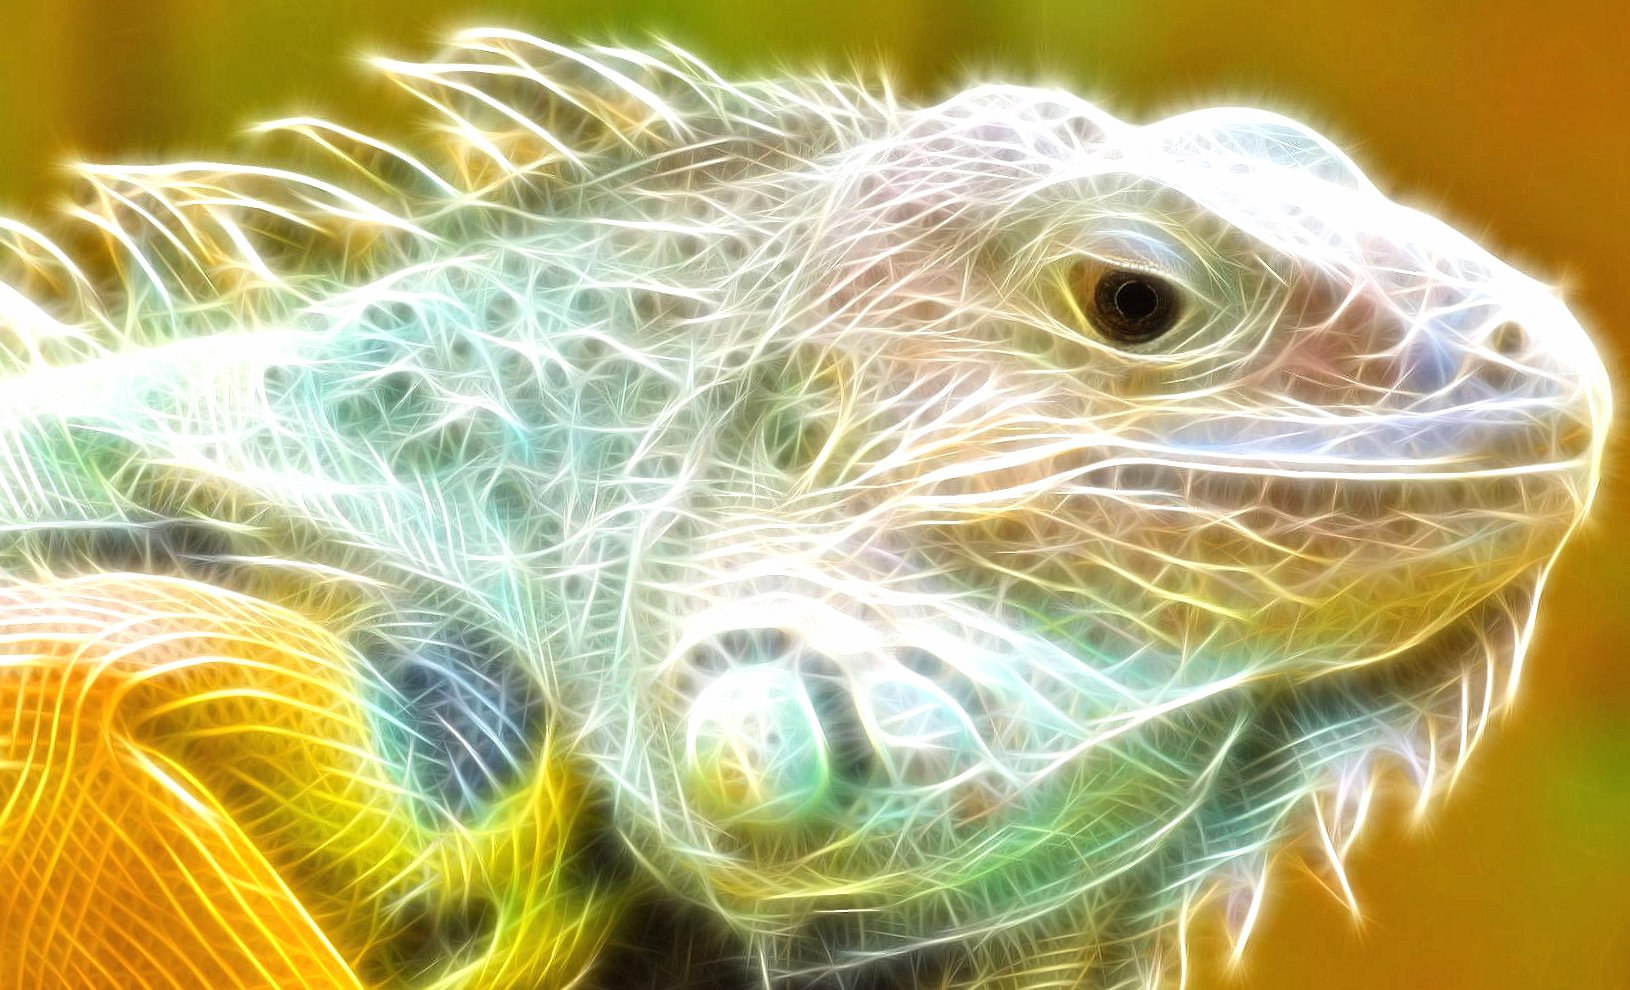 Iguana 3d digital art wallpapers HD quality